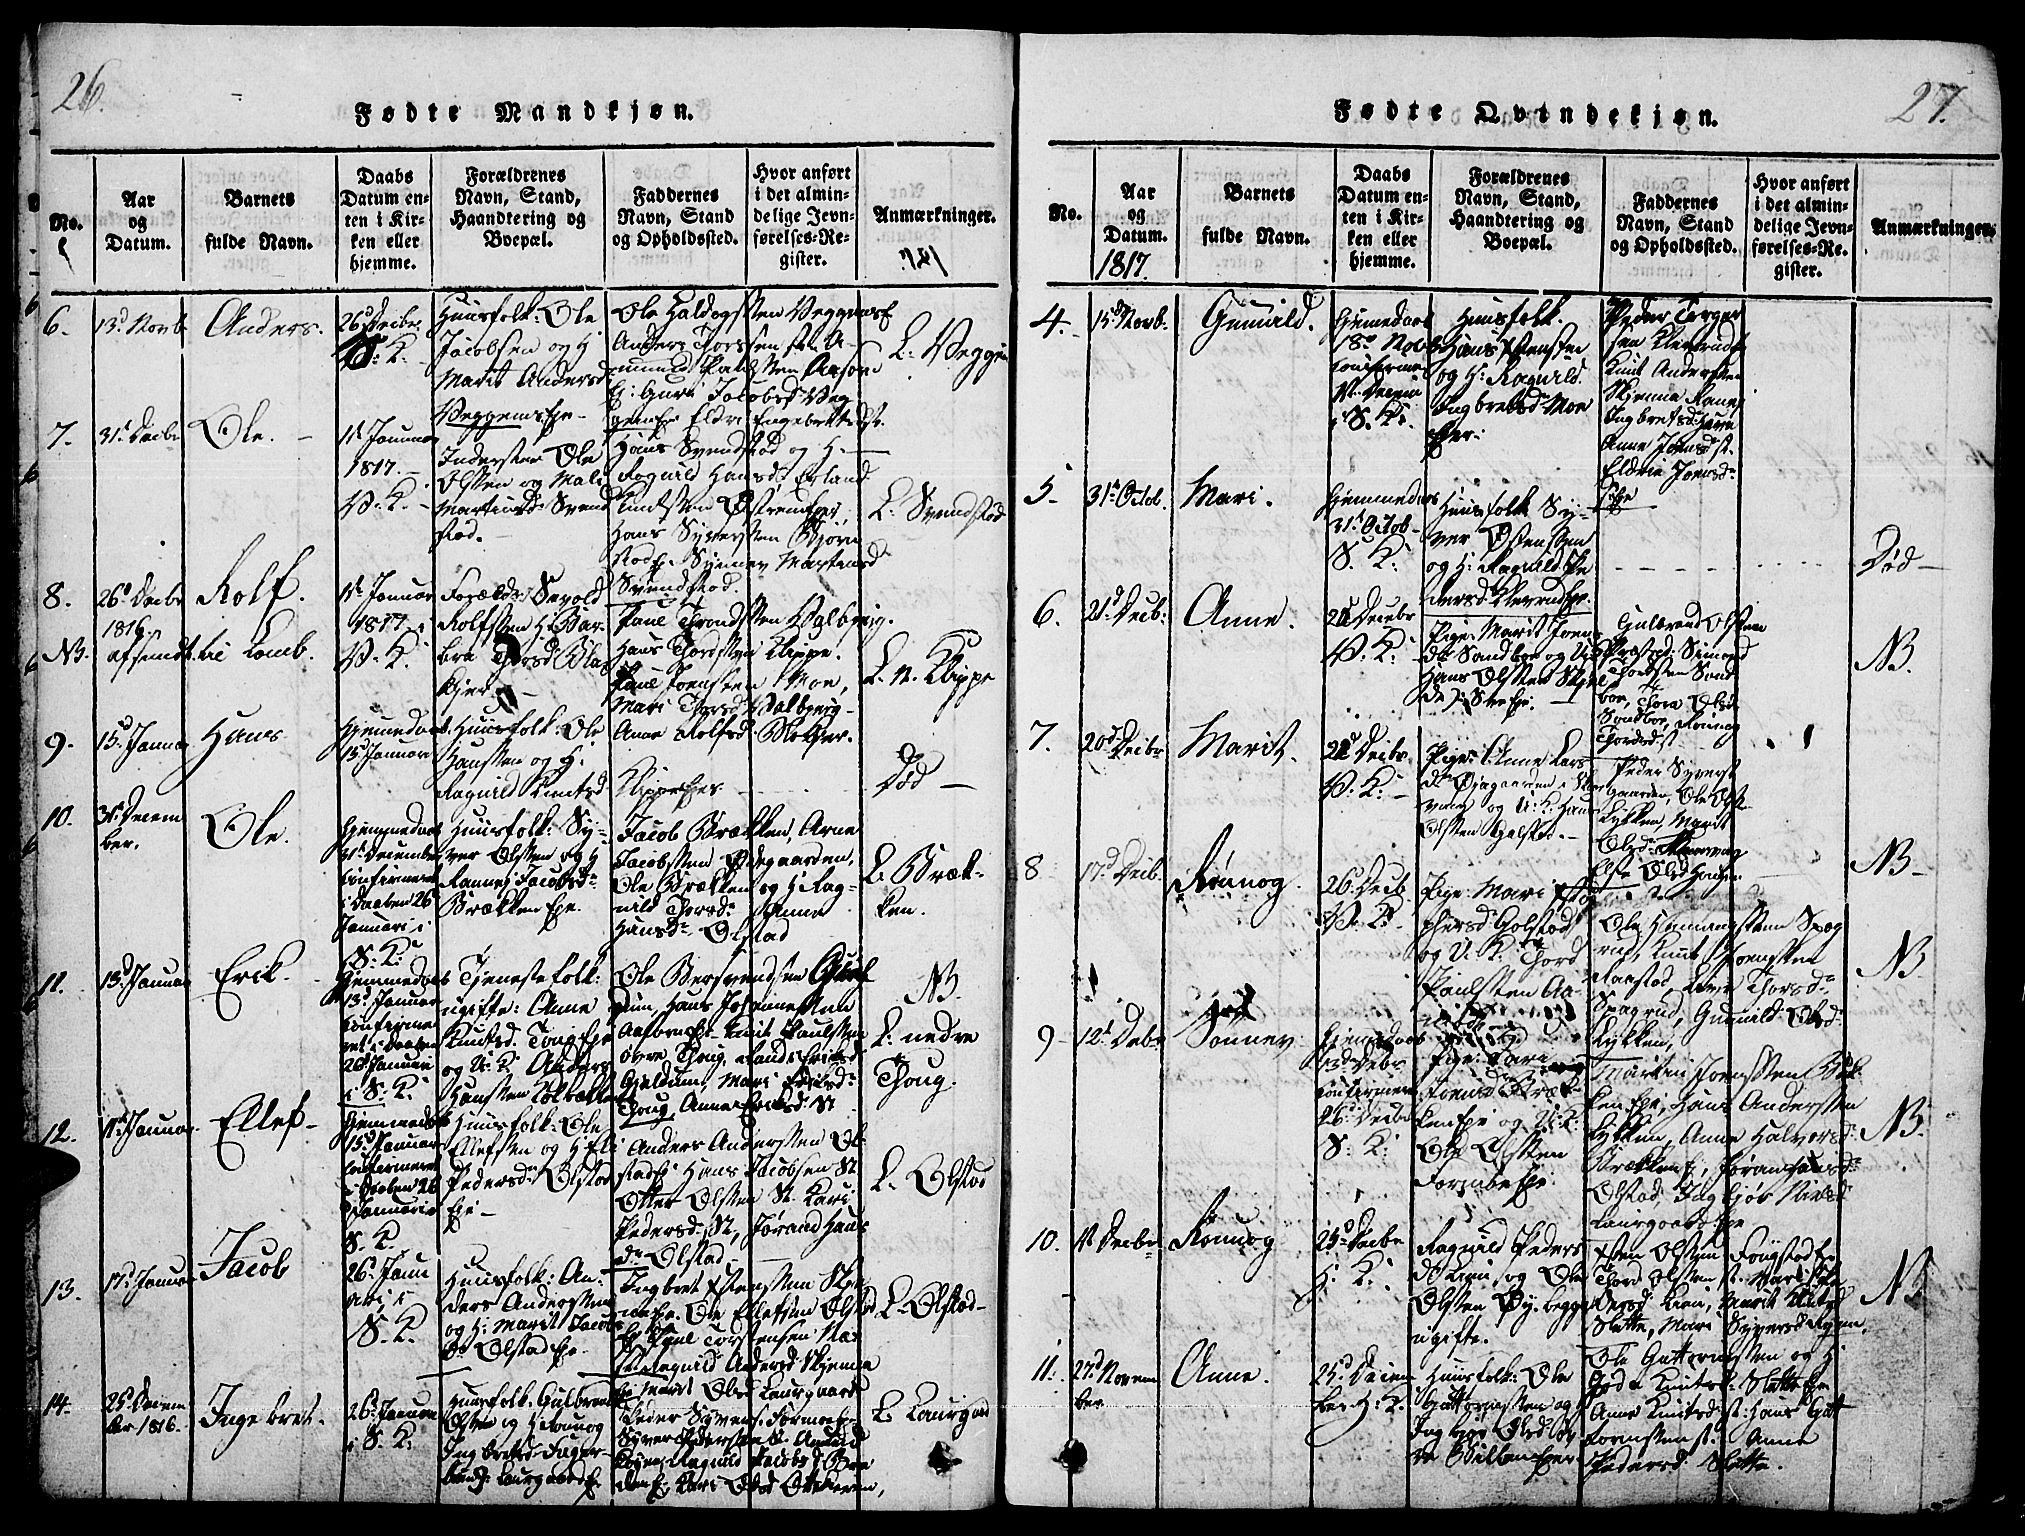 SAH, Vågå prestekontor, Ministerialbok nr. 3, 1815-1827, s. 26-27